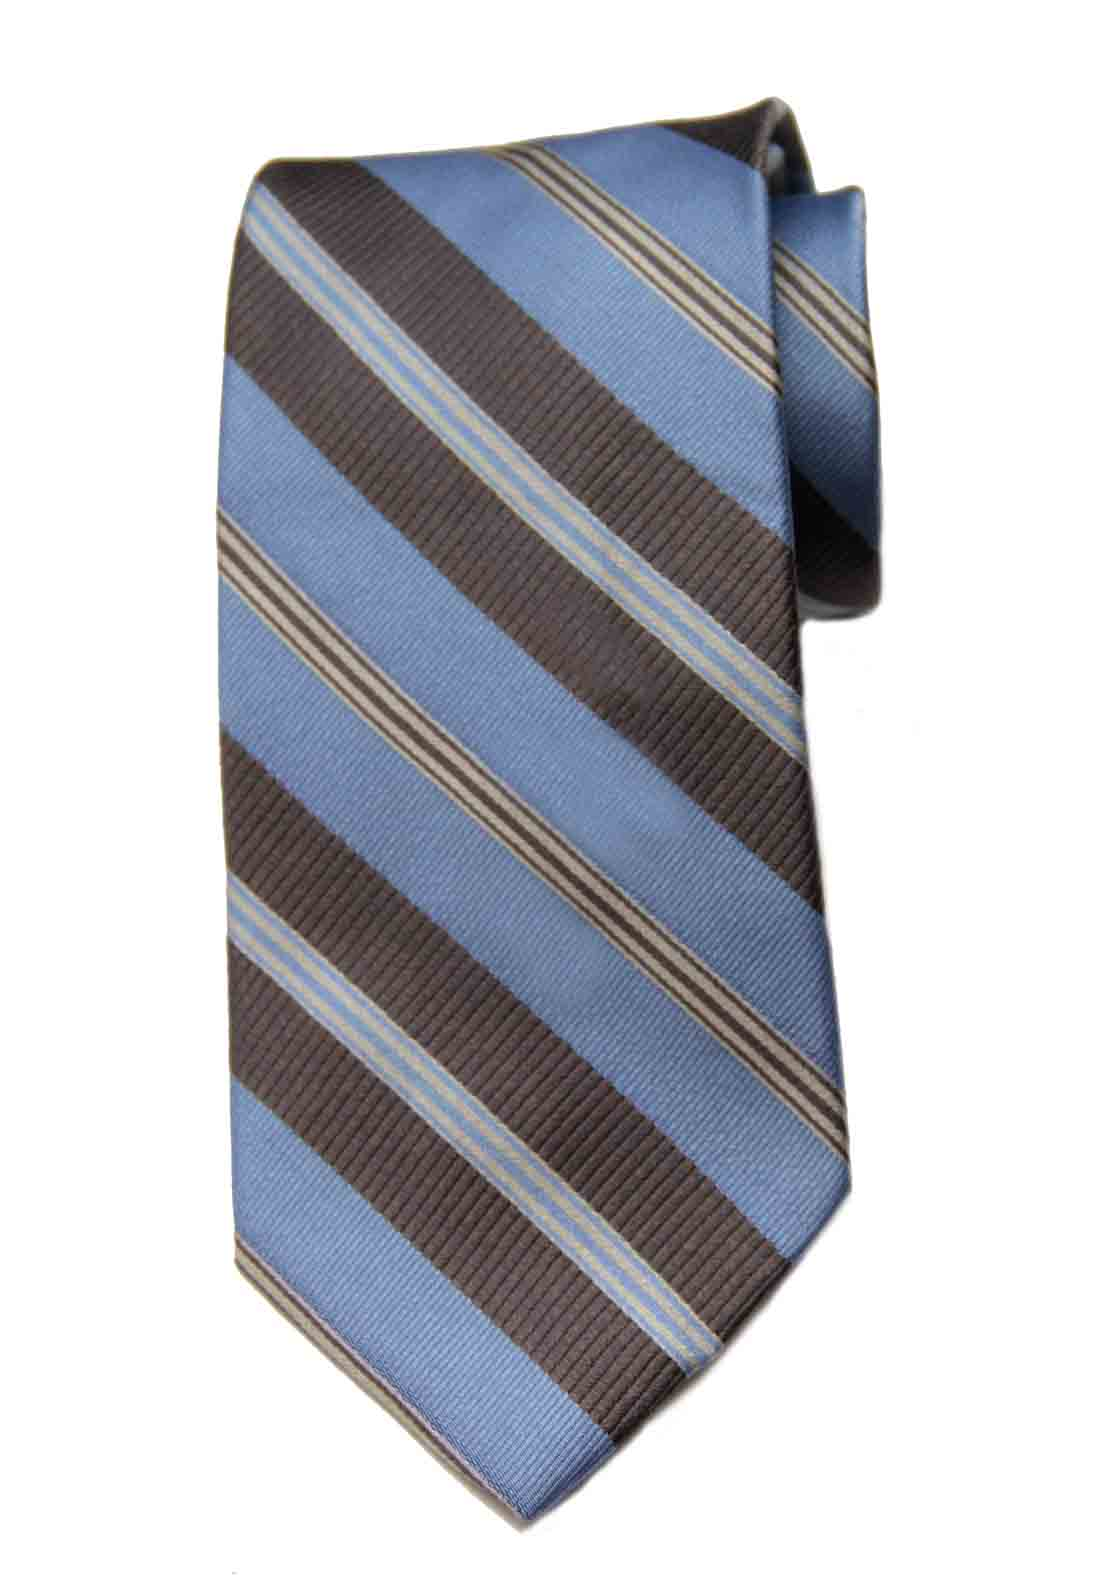 Joseph Abboud Italian Silk Tie Blue Gray White Men's